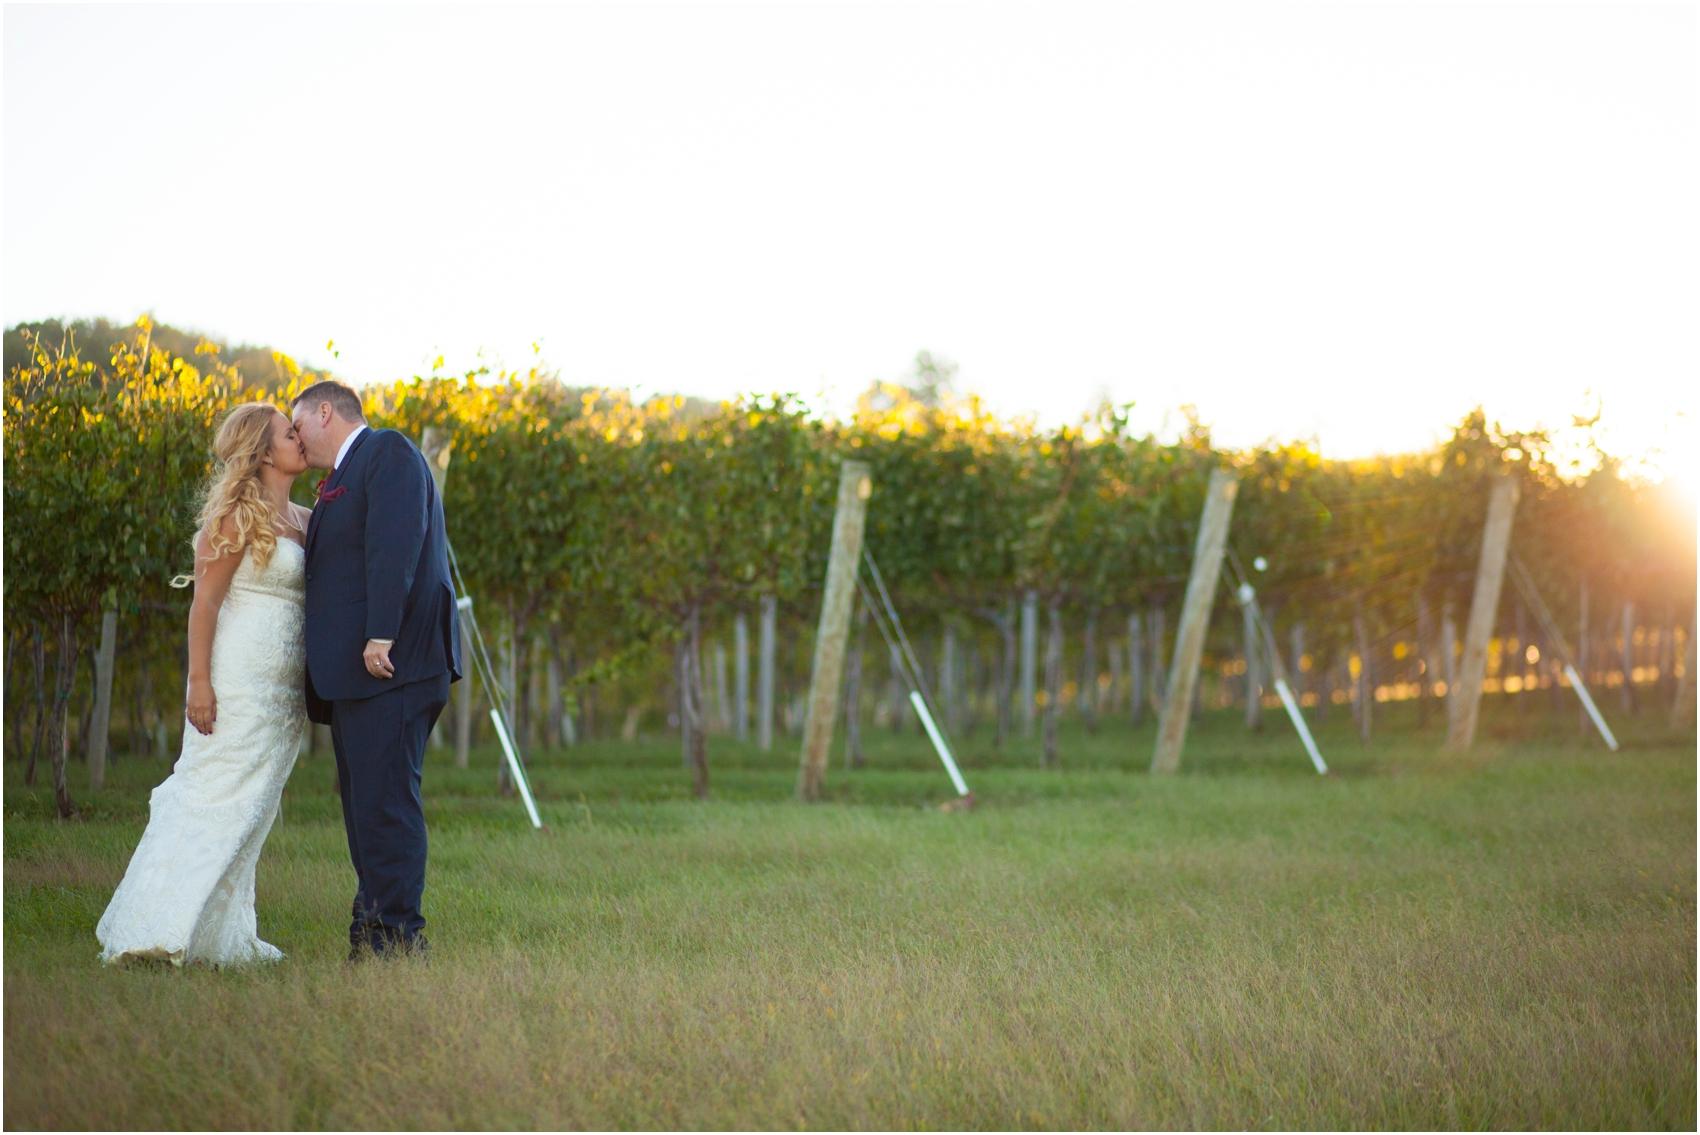 Grace-Estate-Winery-Fall-Virginia-Wedding-7011.jpg